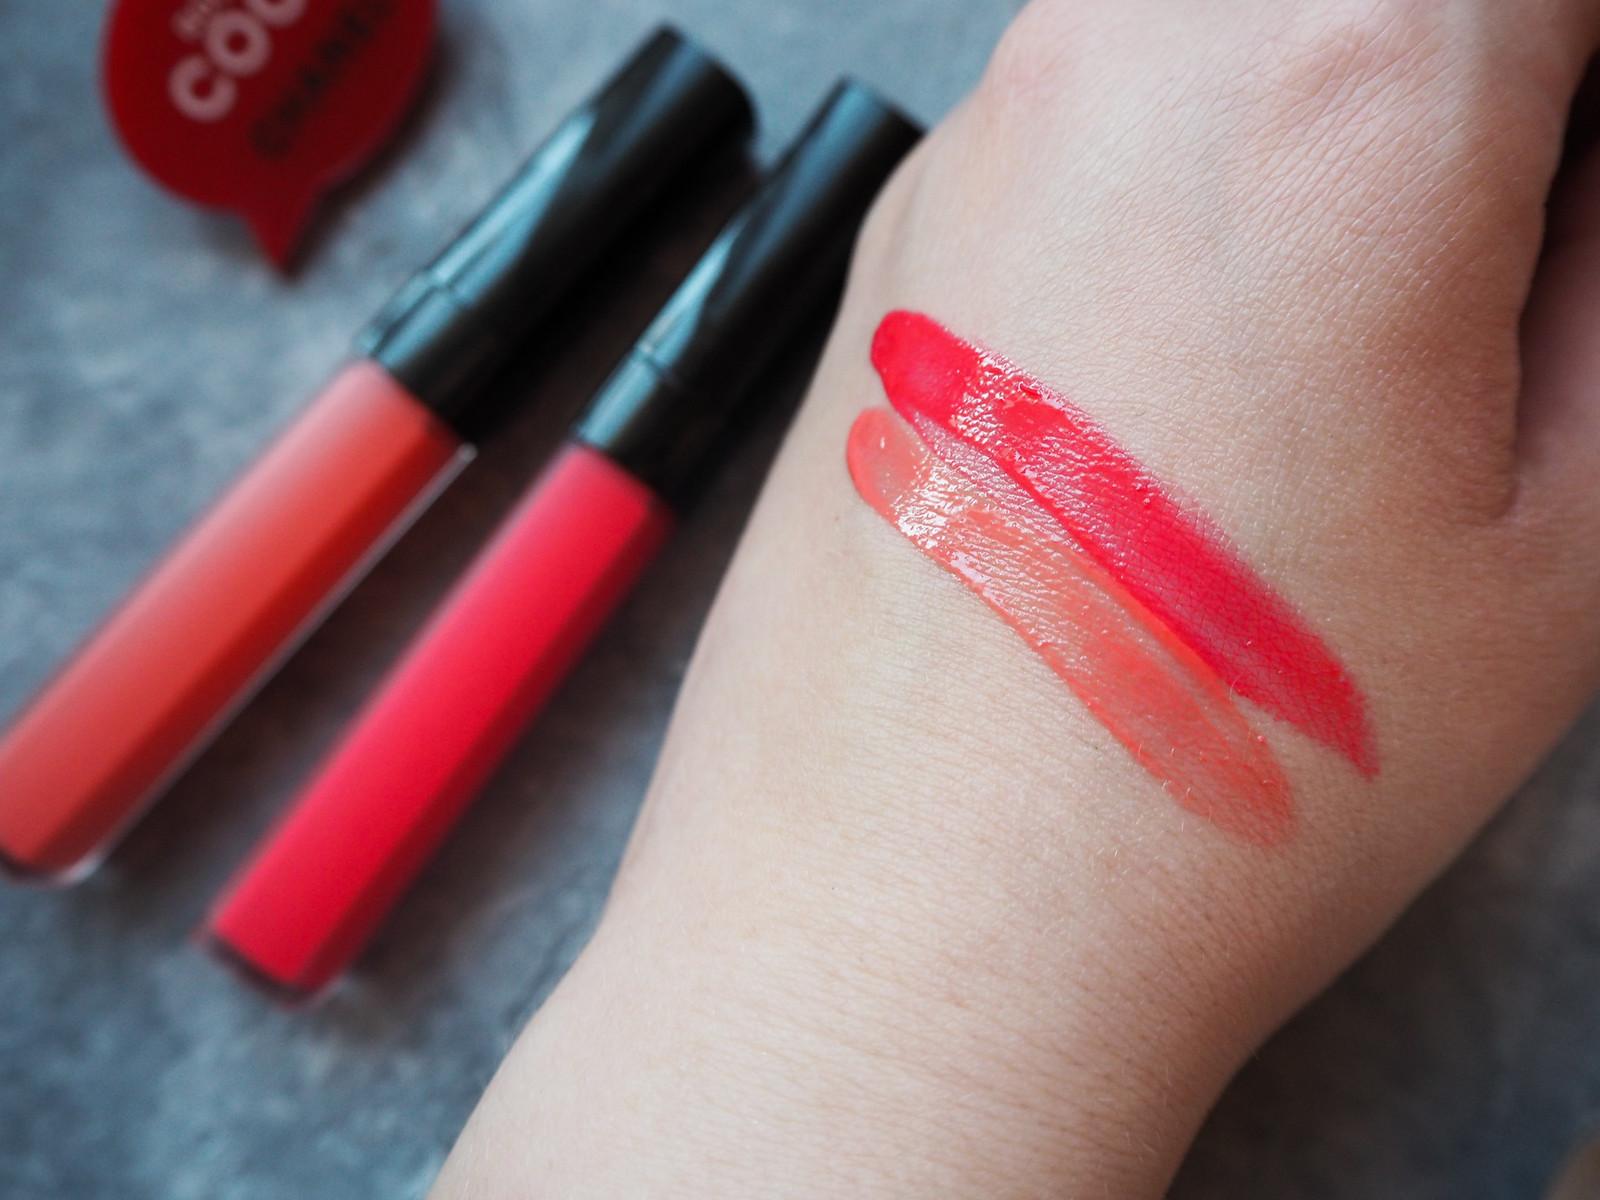 Chanel Rouge Coco Lip Blush 410, 416